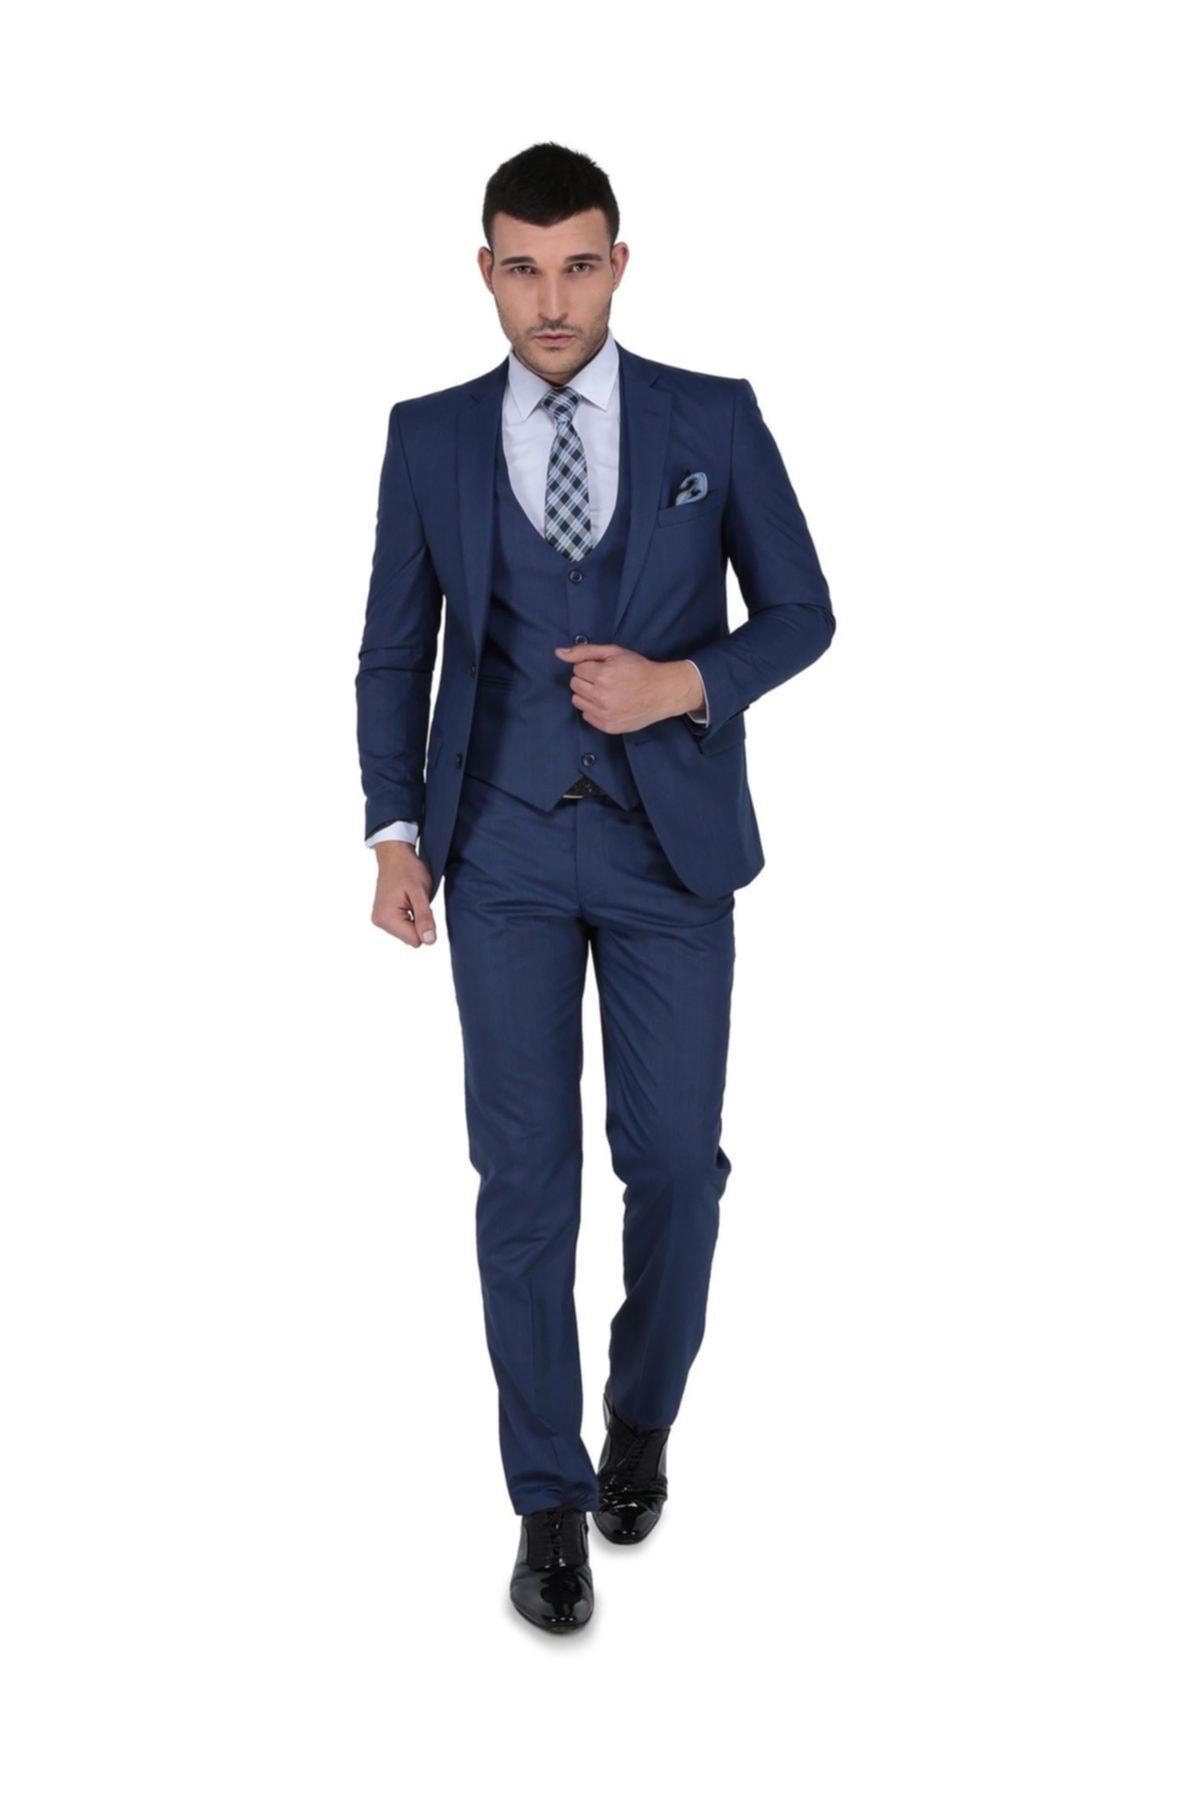 Buenza Erkek Luca Mono Yelekli Dar Kalıp Takım Elbise-3B4M0434D025 1